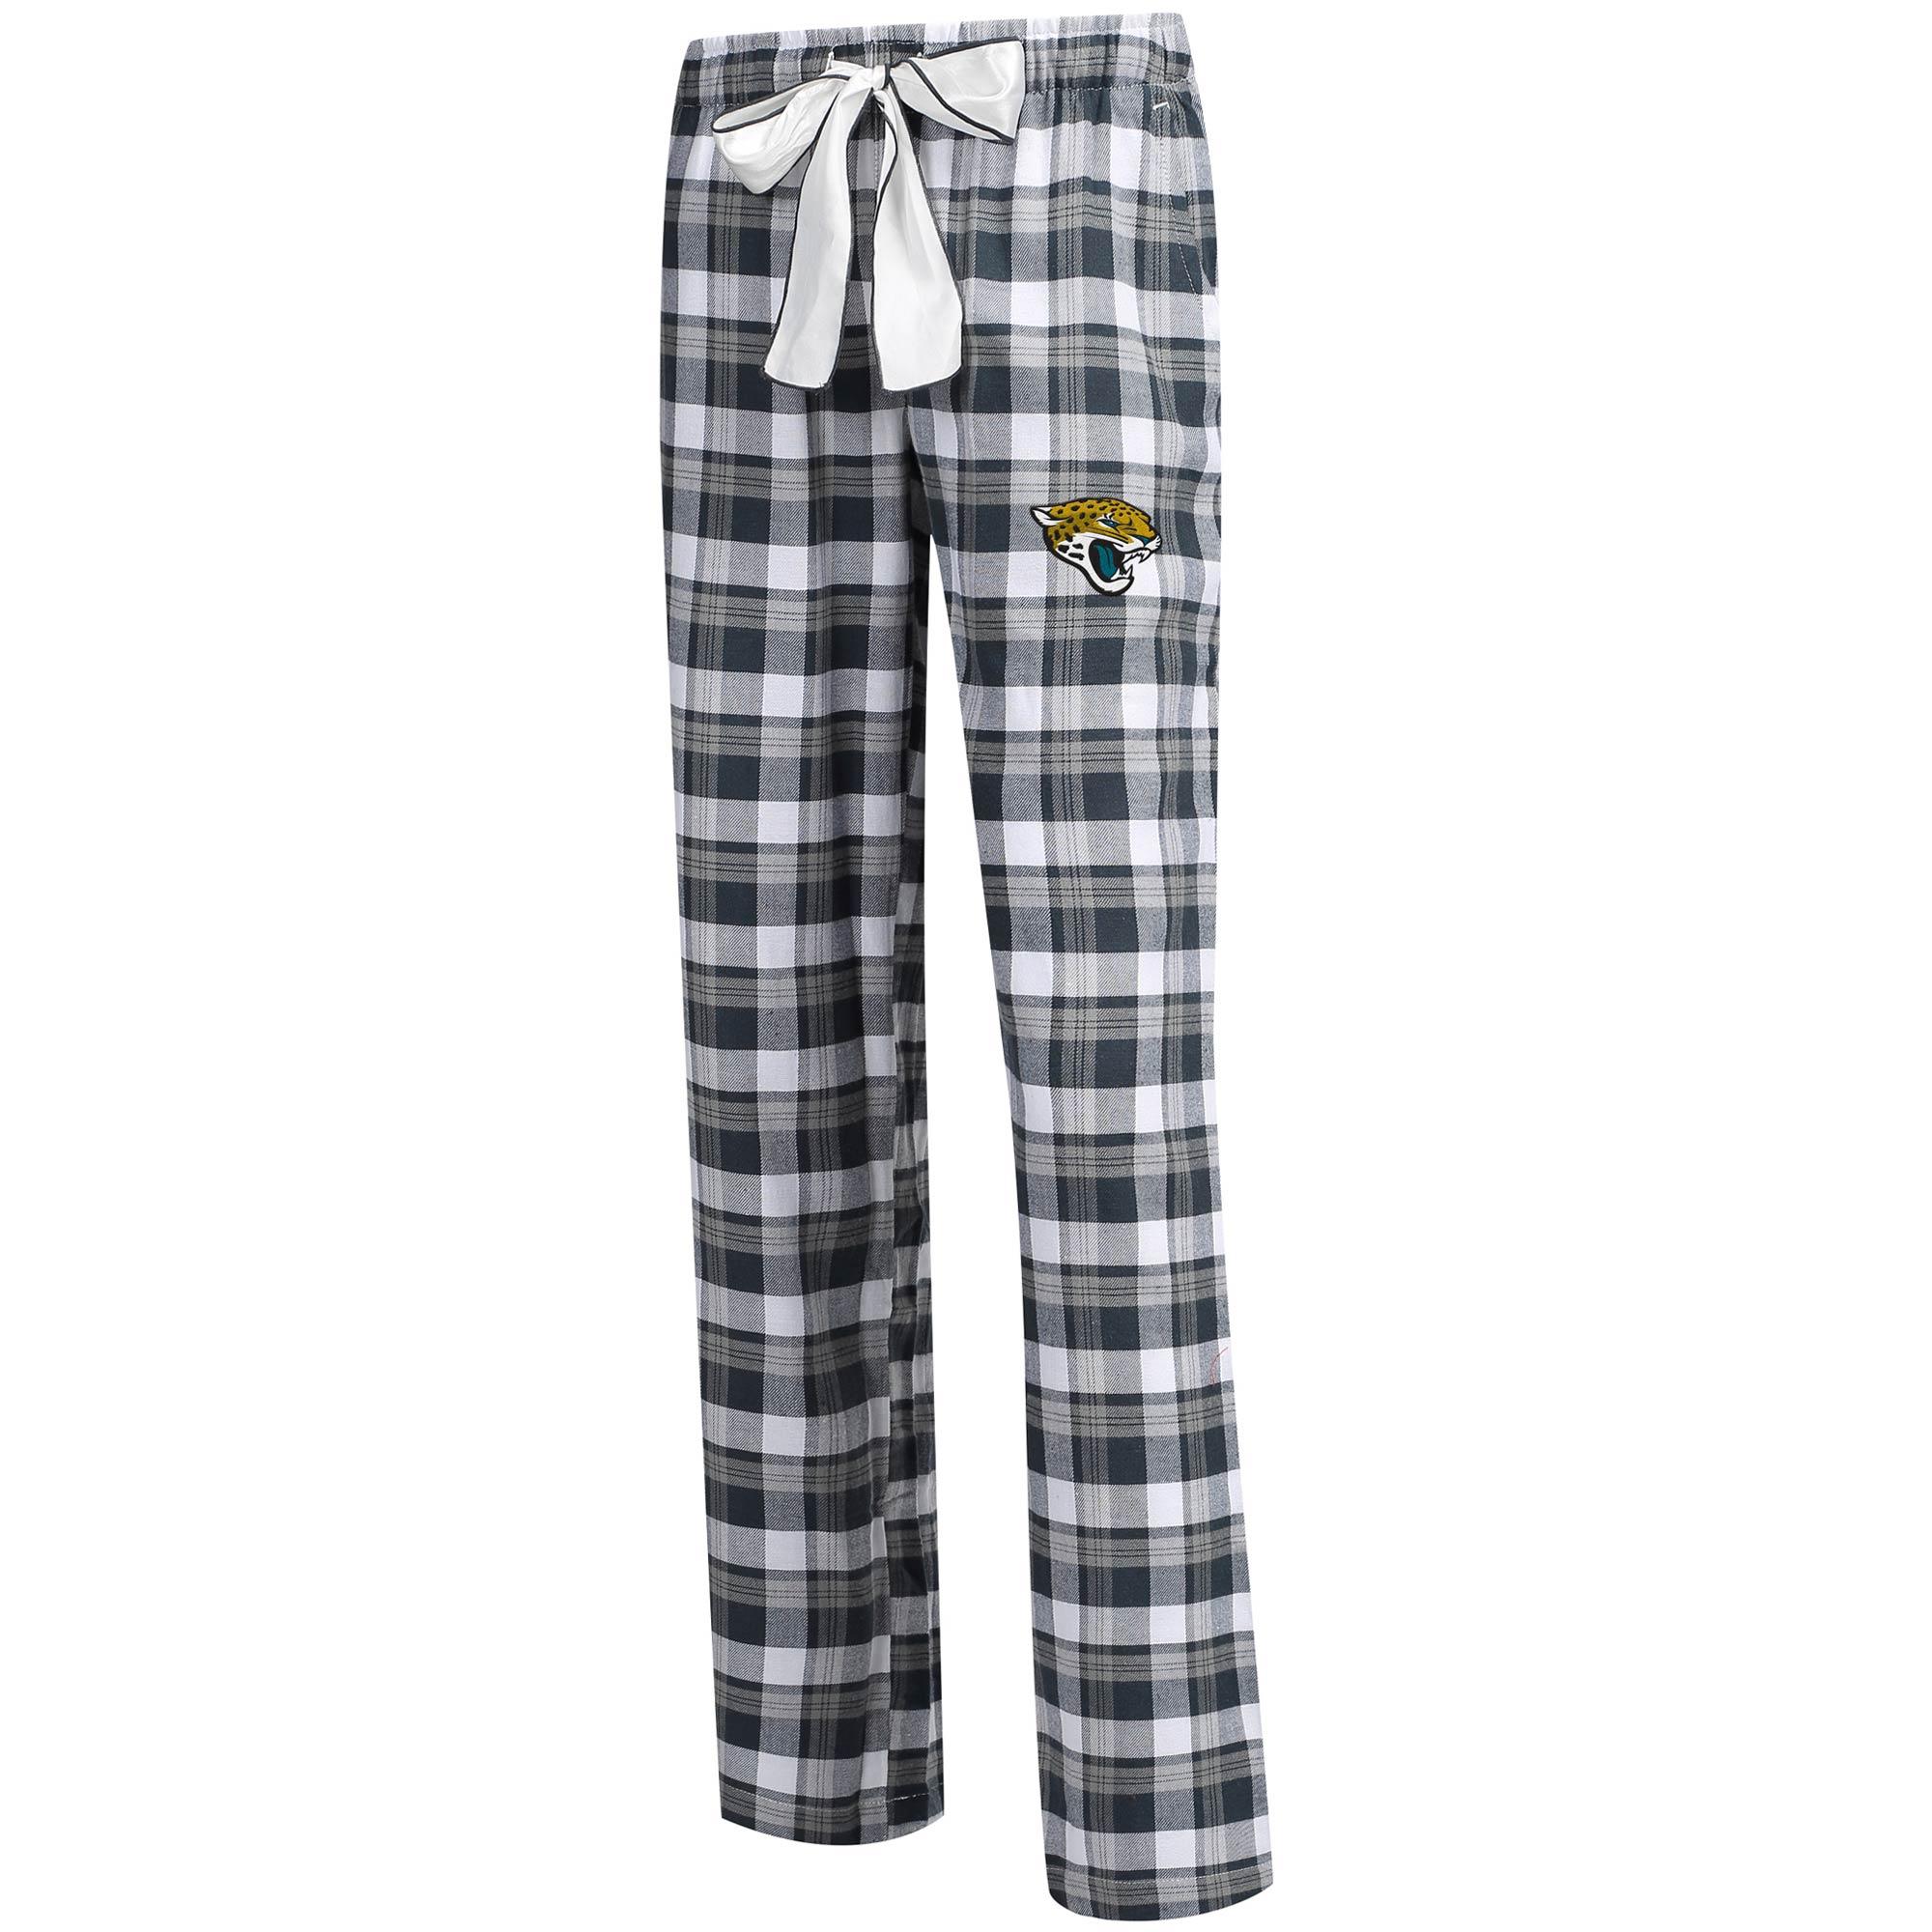 Jacksonville Jaguars Concepts Sport Women's Piedmont Flannel Sleep Pants - Charcoal/Gray